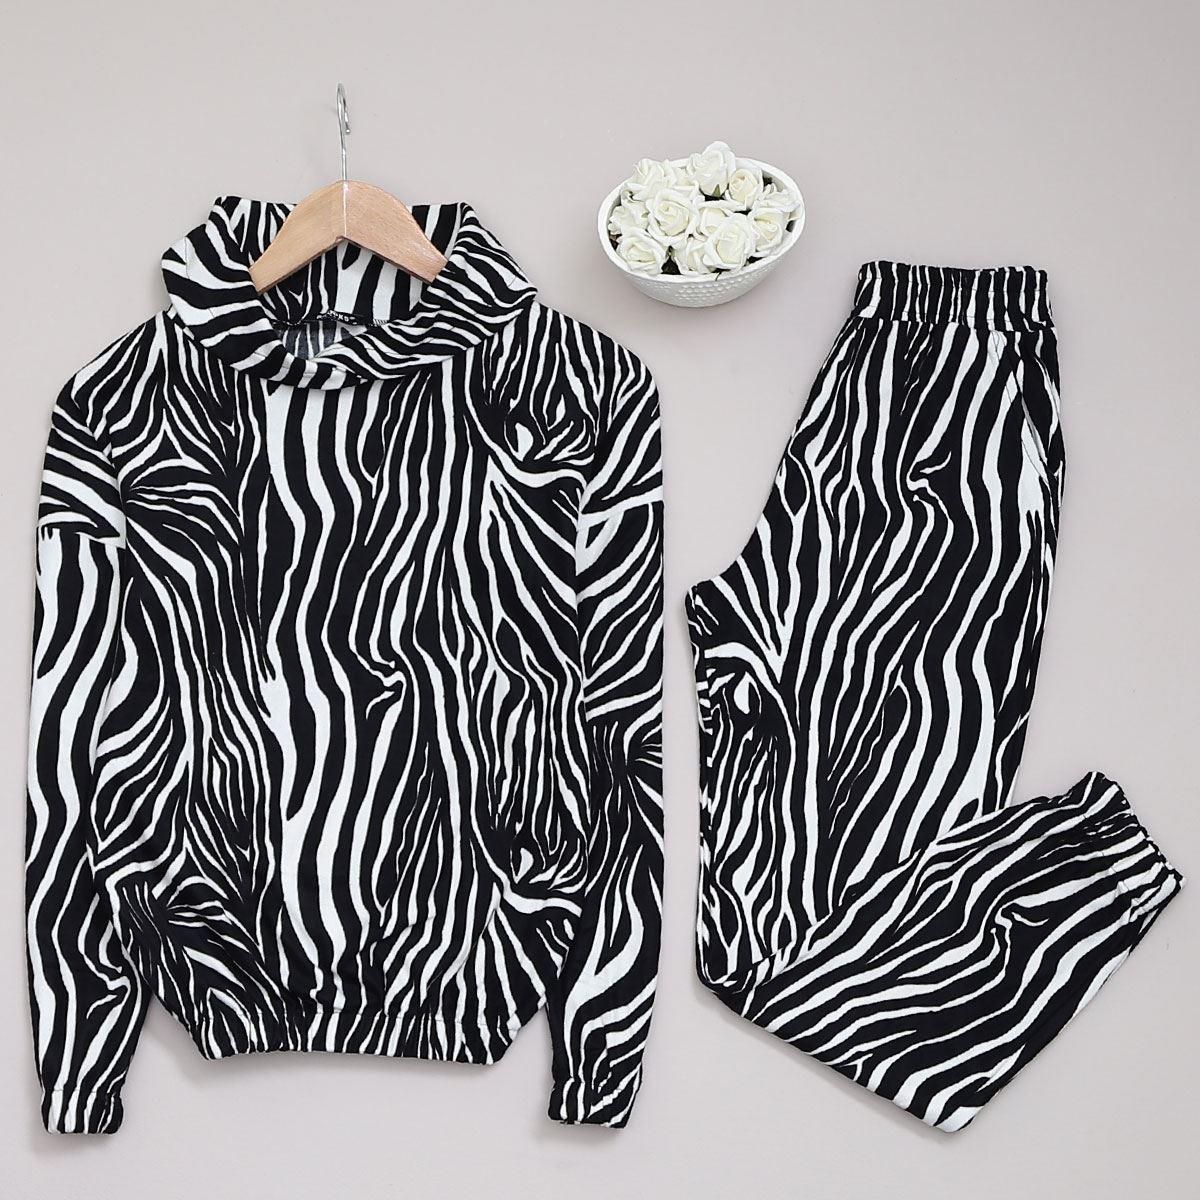 Zebra Desenli Takım TKM990